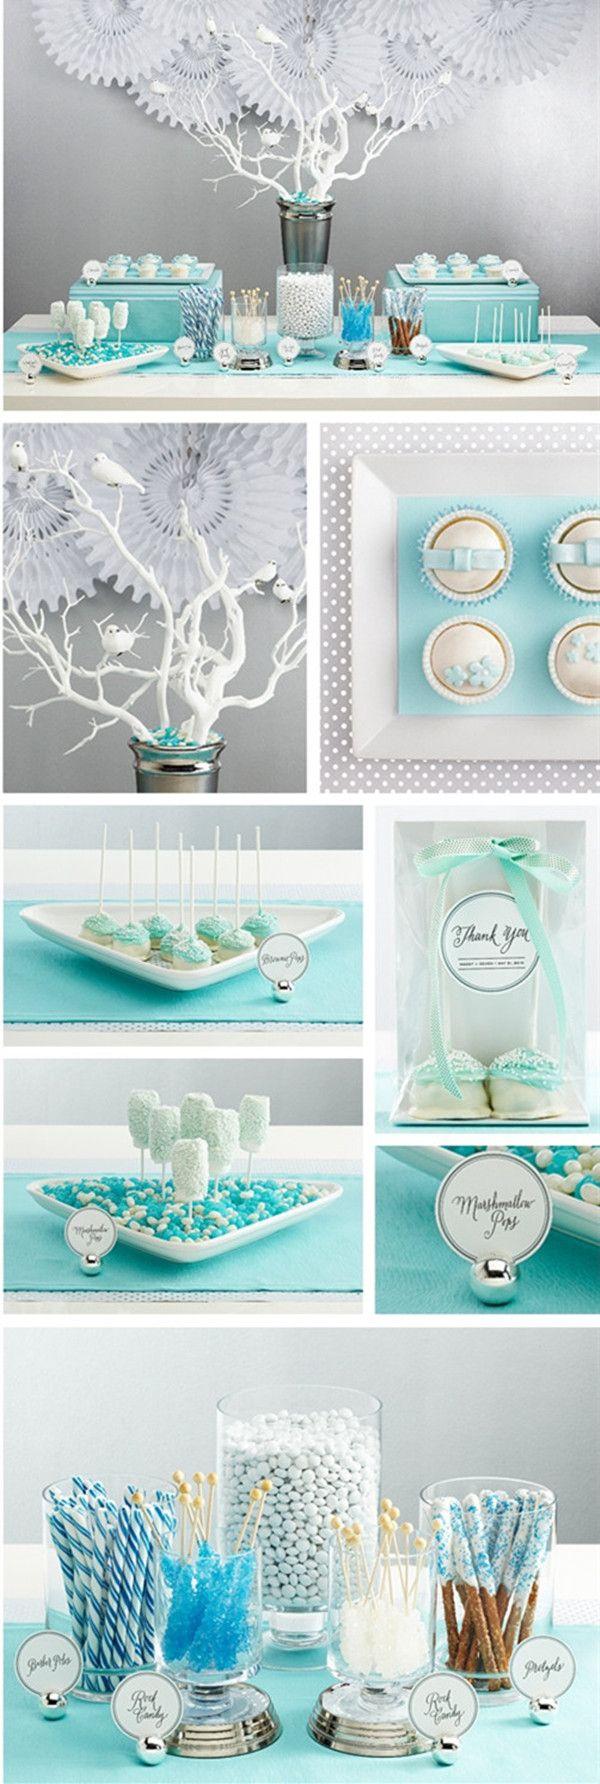 2014 tiffany blue baby shower theme ideas